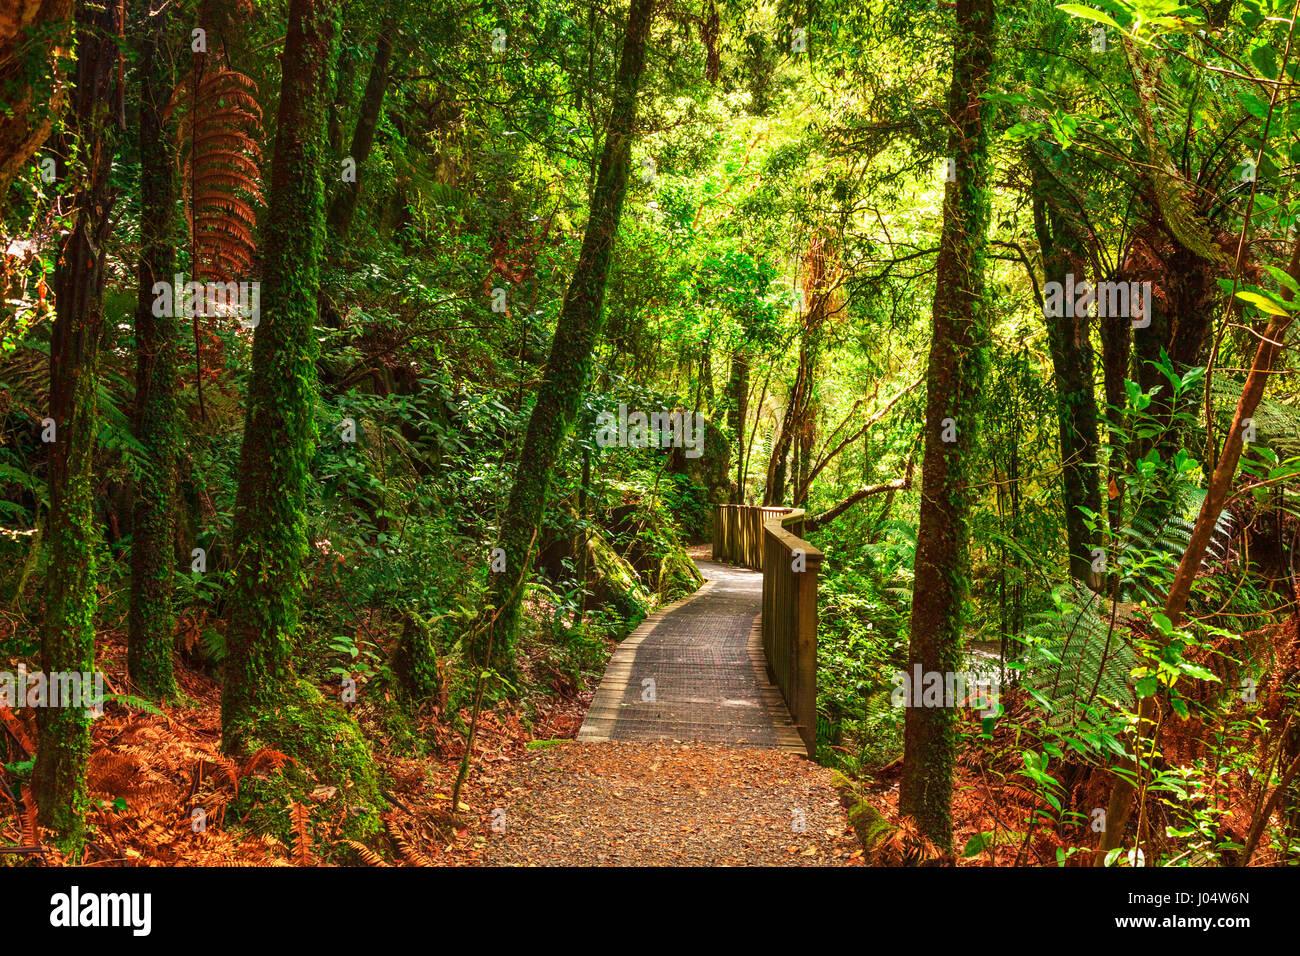 Pathway through New Zealand native bush, Mangapohue Natural Bridge, Waitomo District, Waikato, New Zealand. - Stock Image